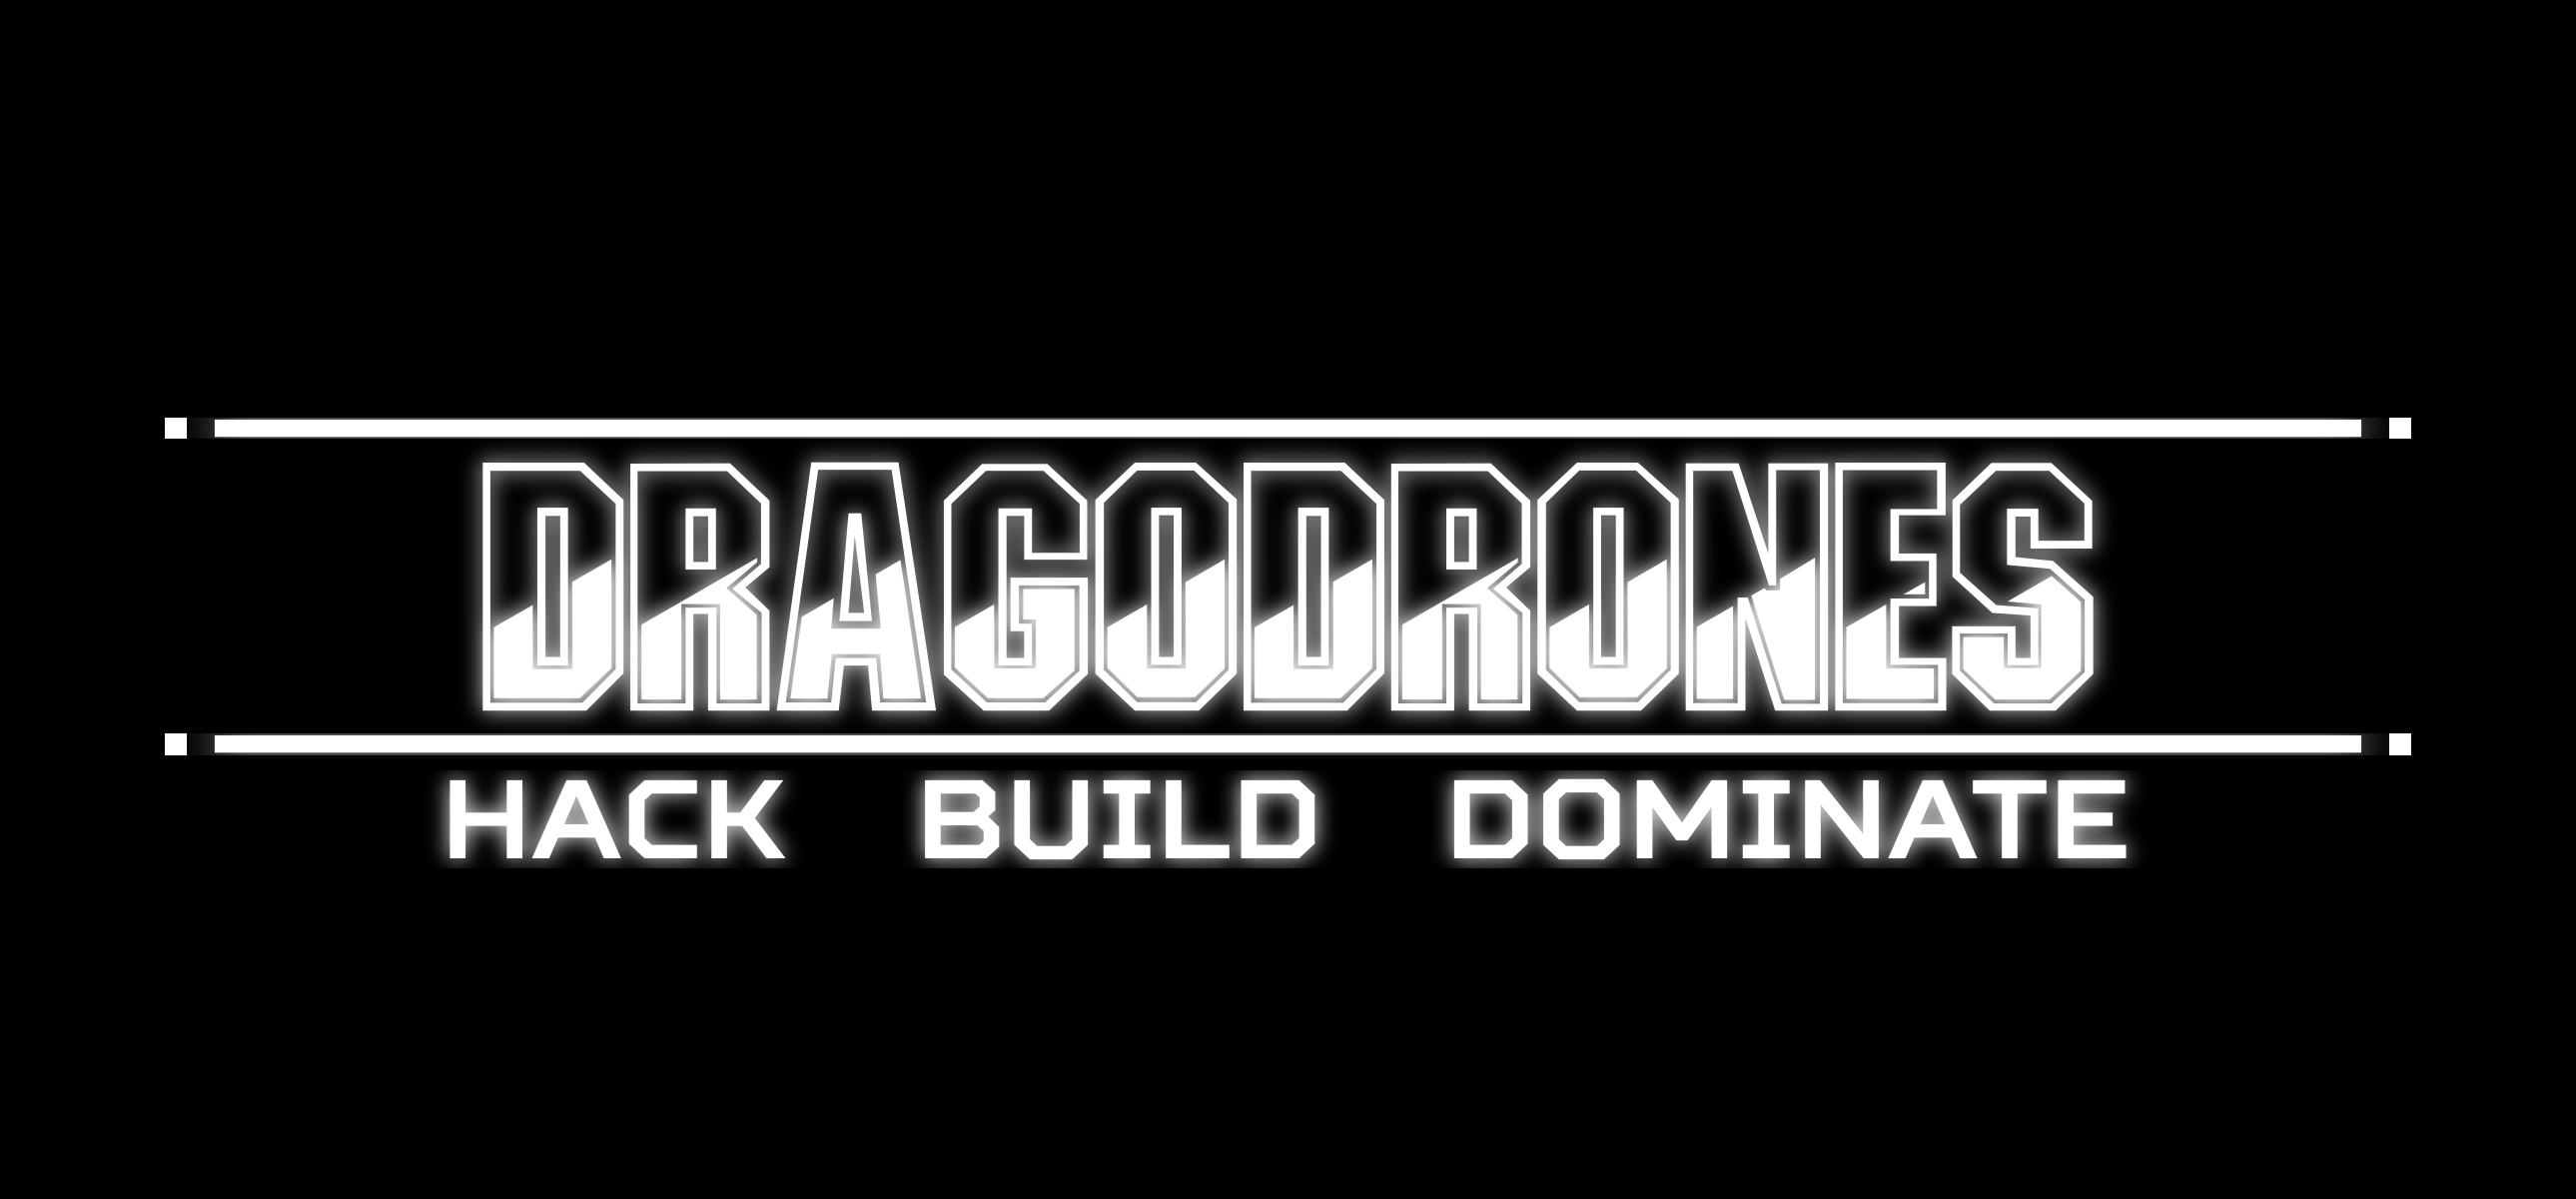 Dragodrones